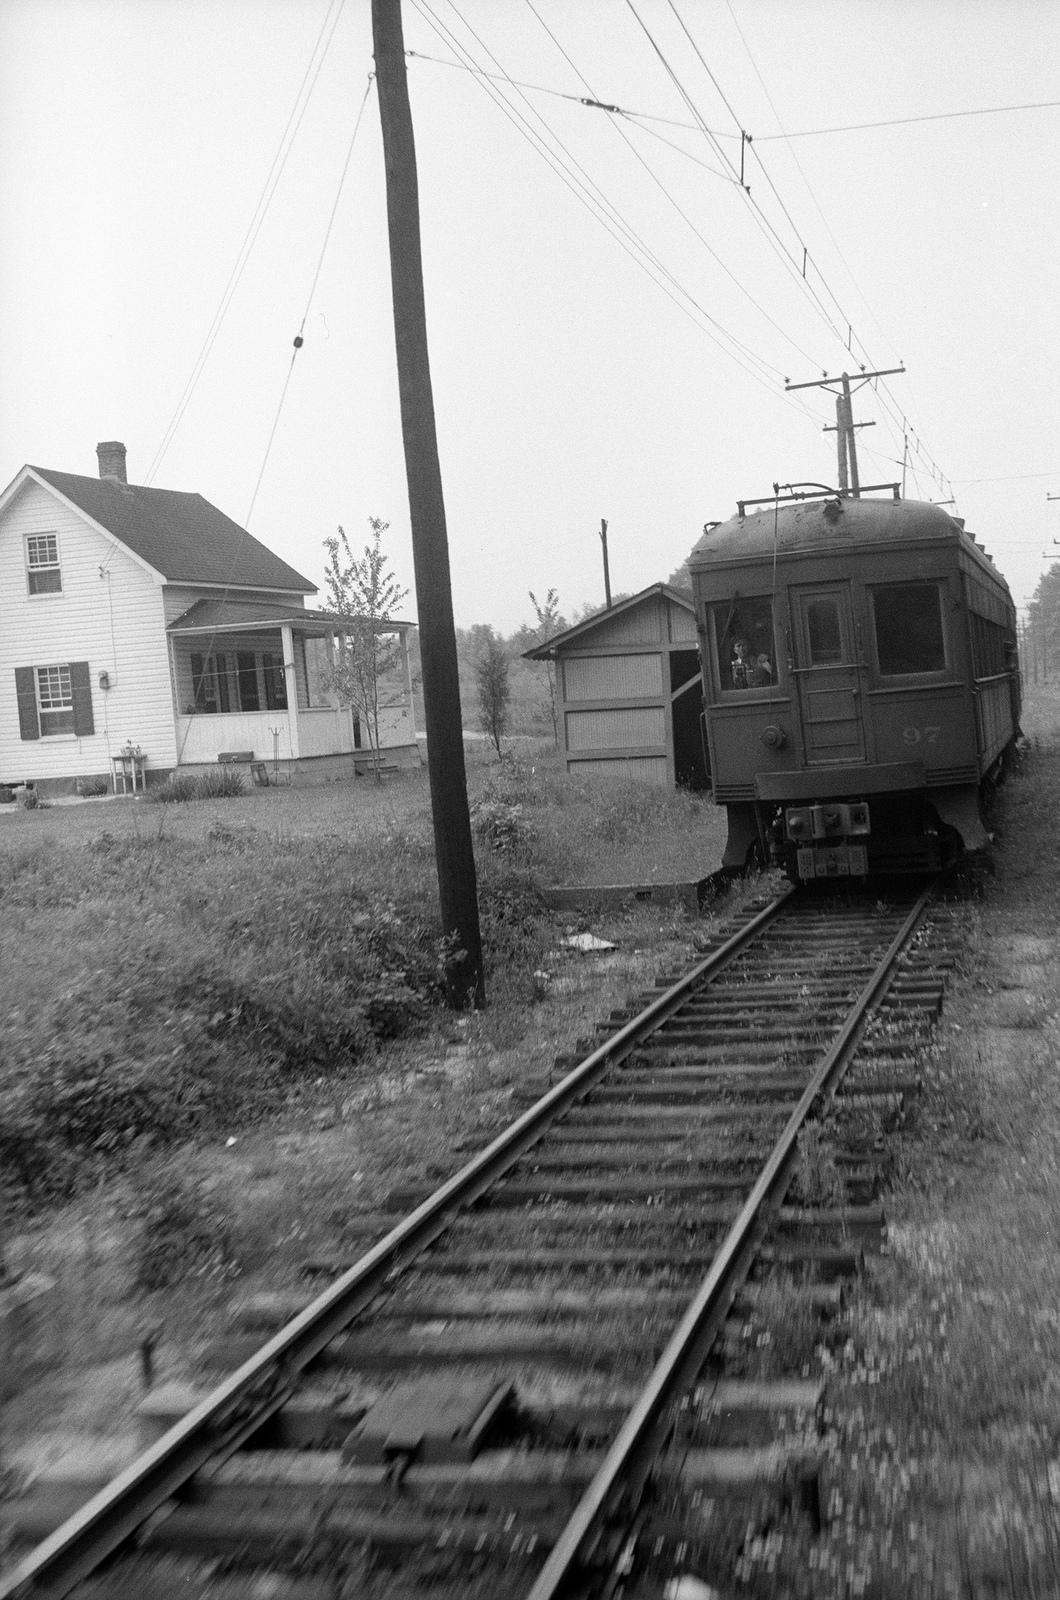 Baltimore &Annapolis Railroad Car #97 passing Marley Station. Maryland Circa 1940's. Source: Hugh Hayes Collection.